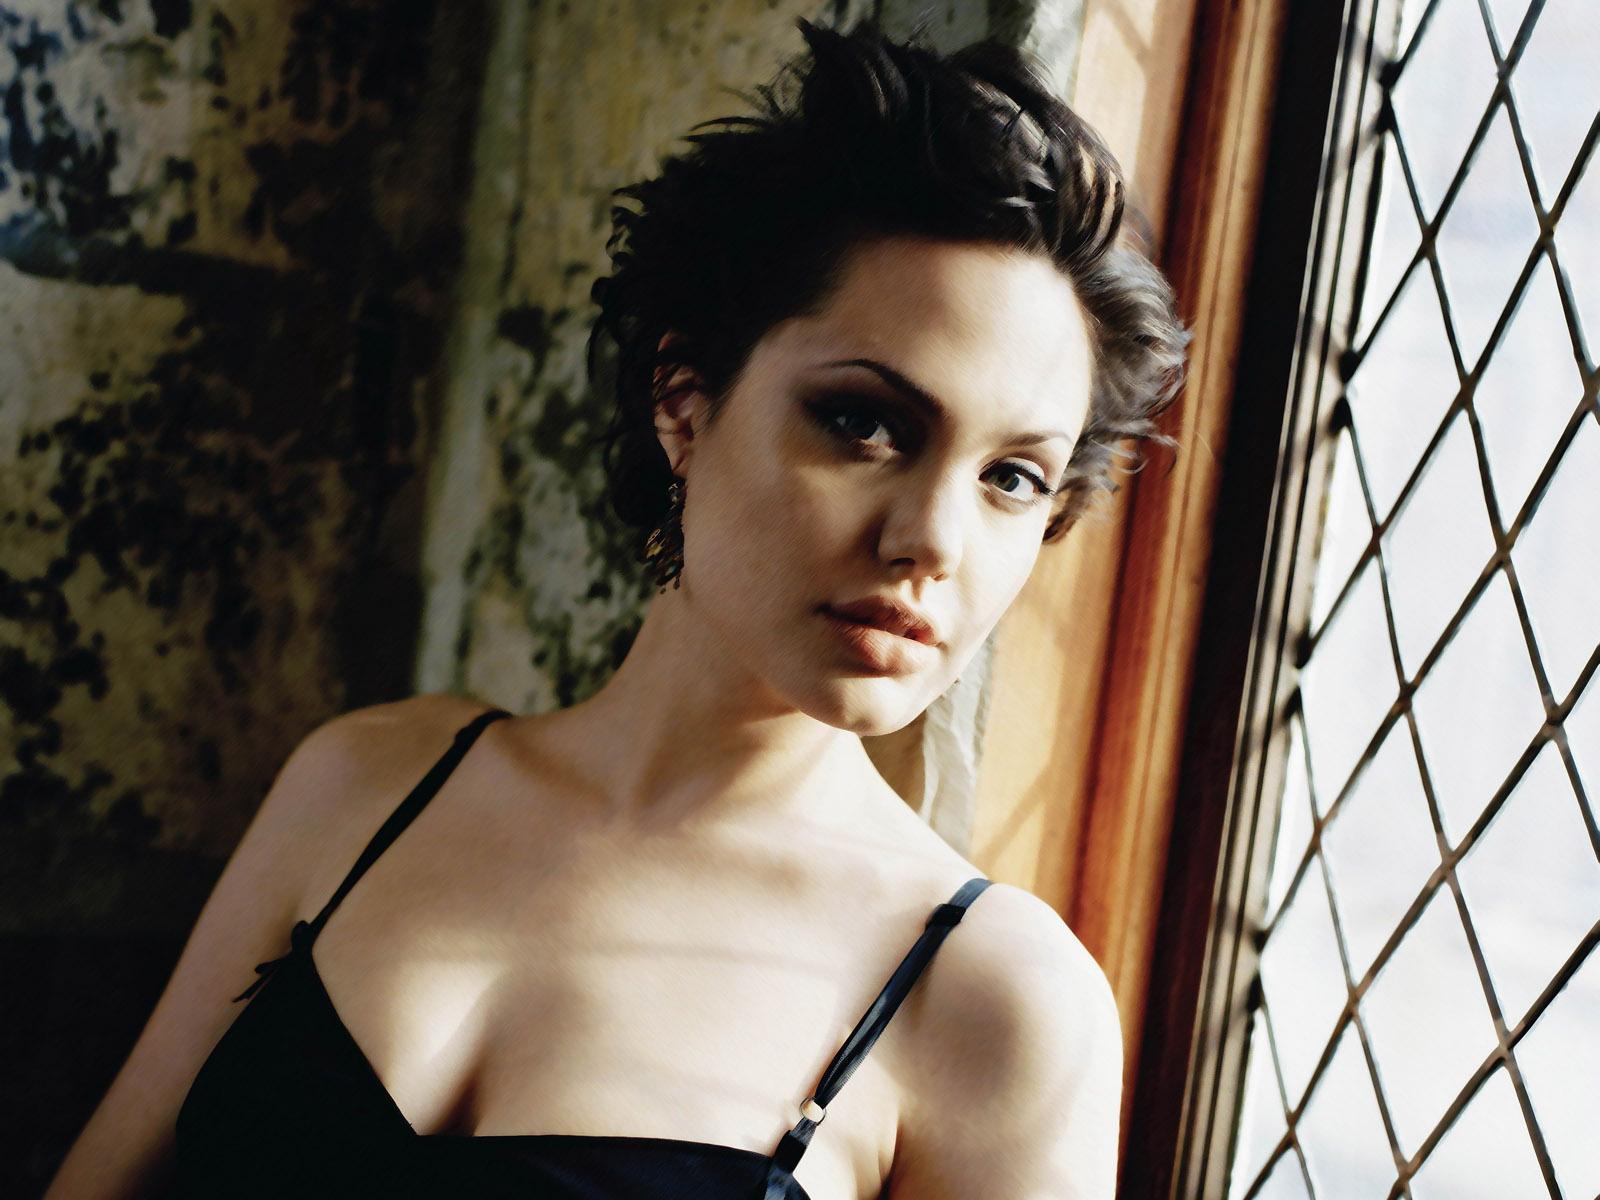 Angelina Jolie Hair Styles: Celebrity Hairstyle: Angelina Jolie Short Hairstyles